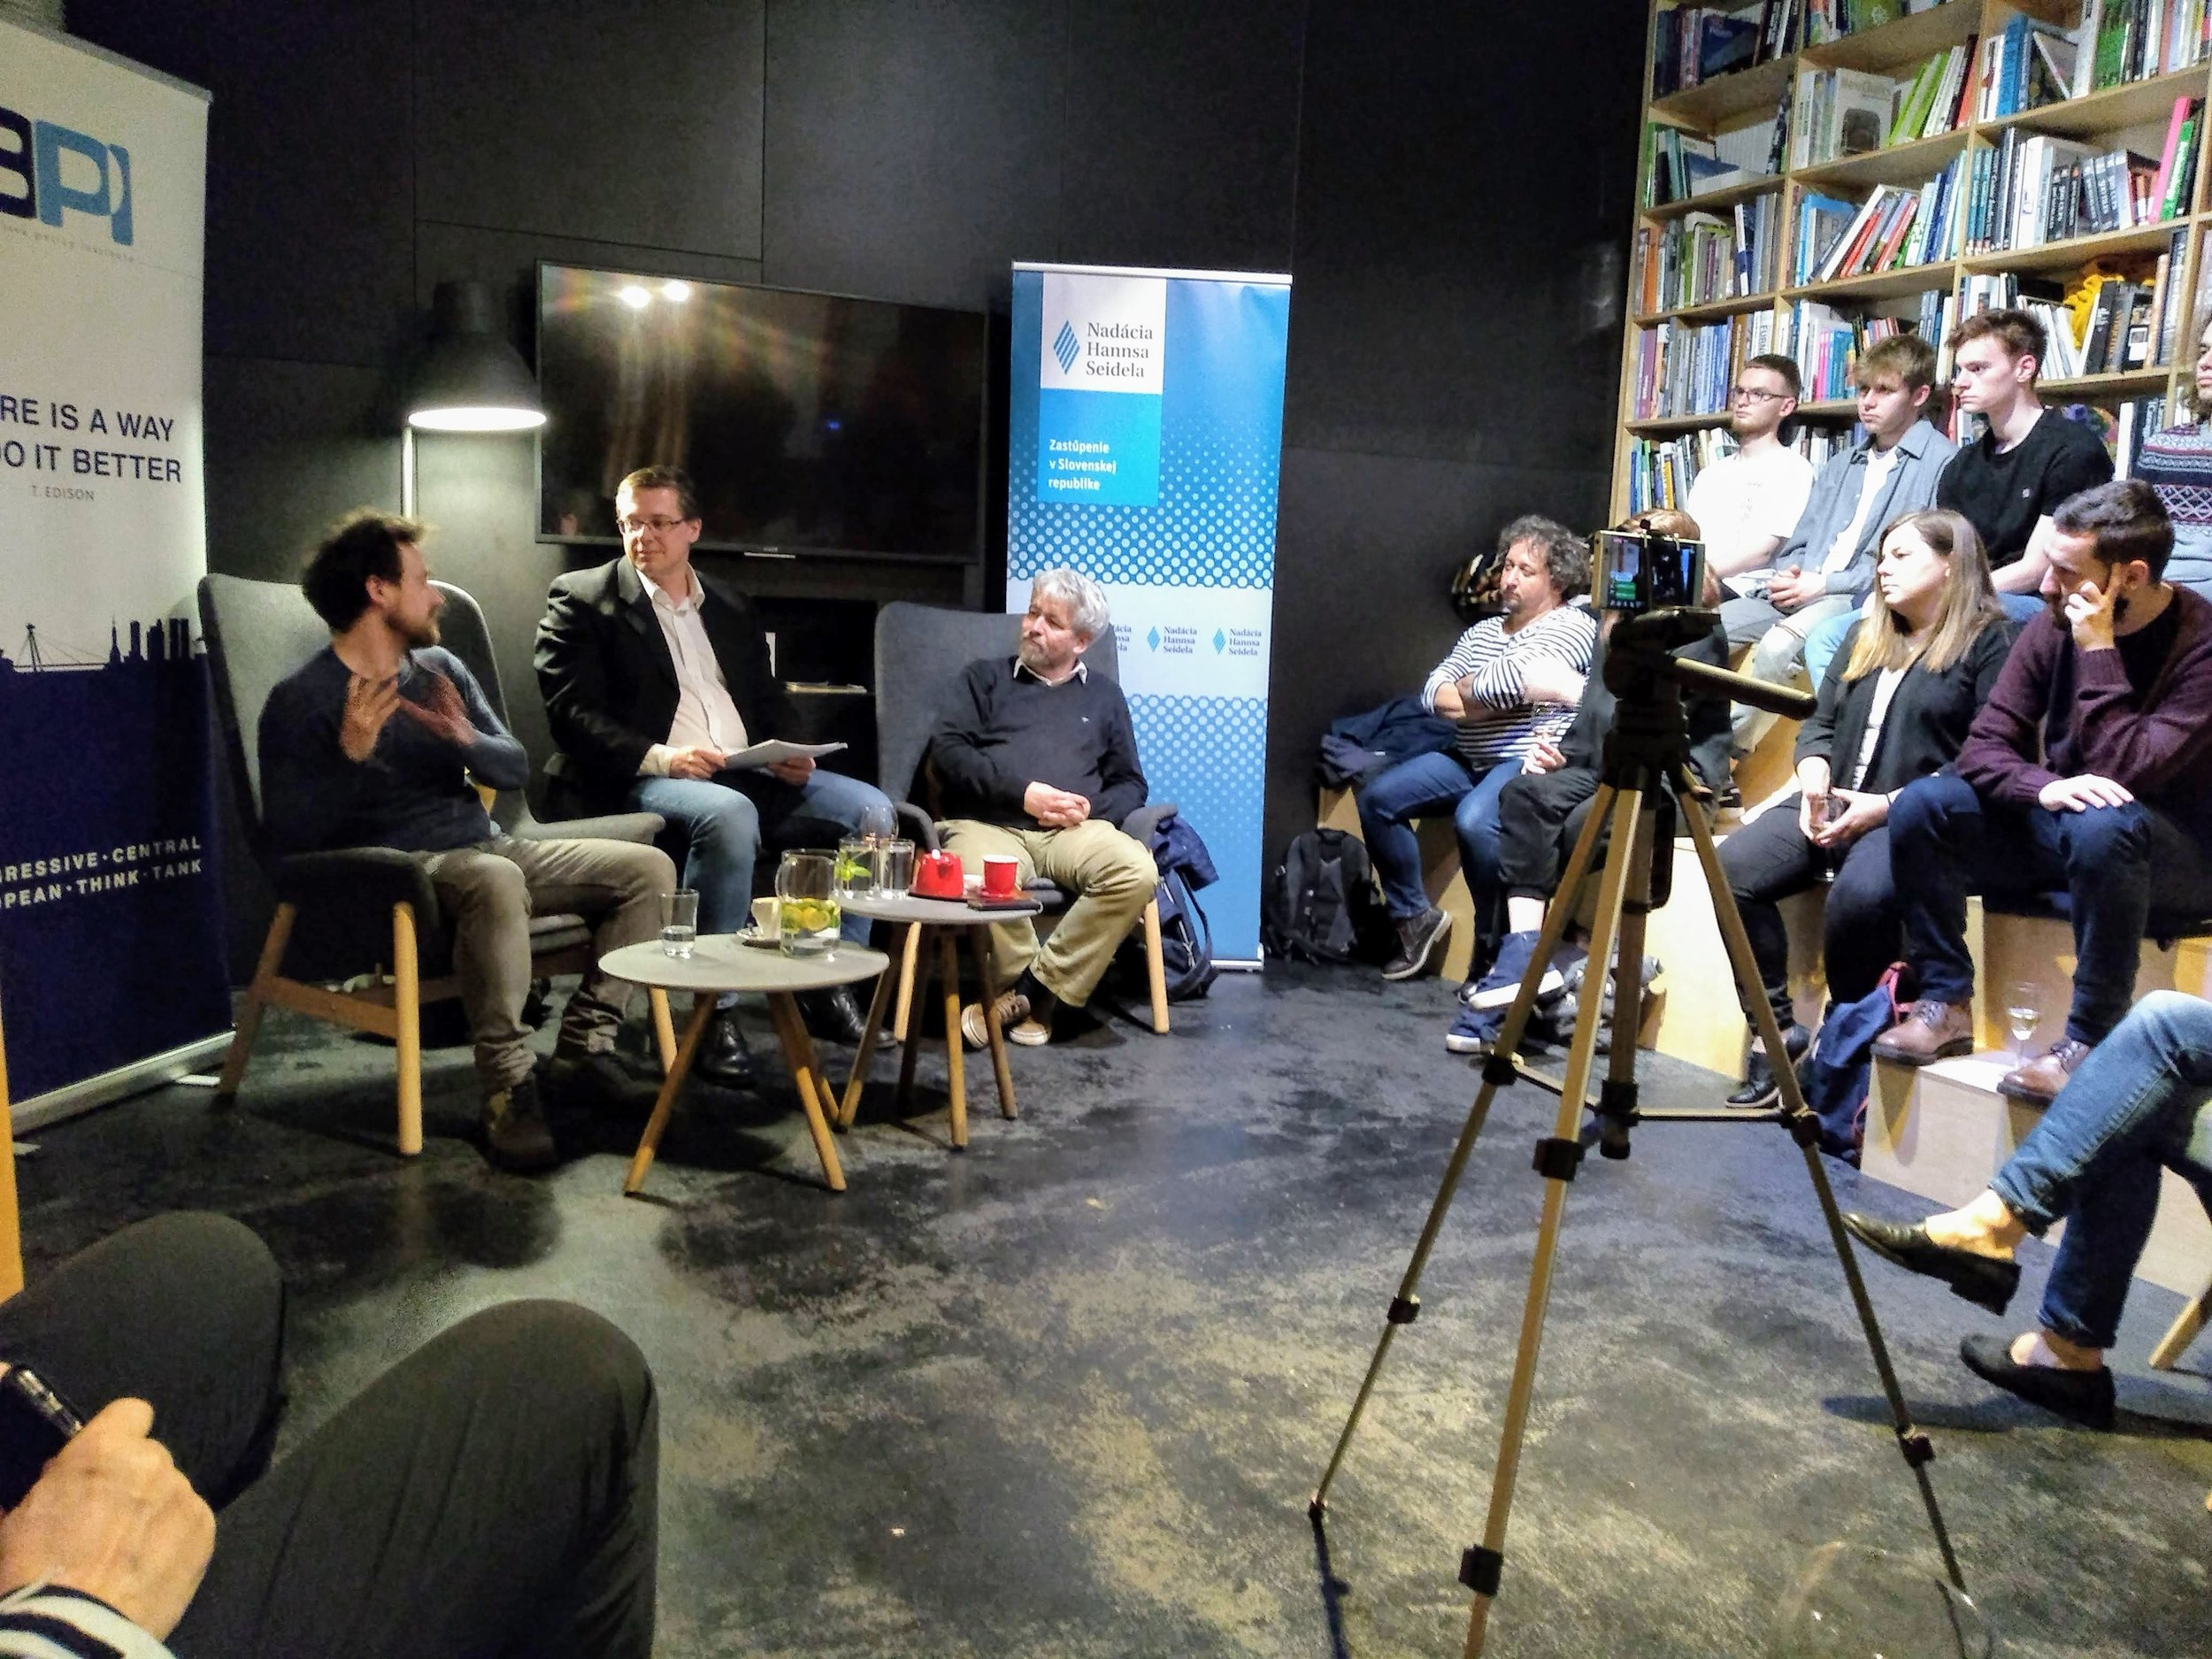 Prof. Vašečka in discussion with blogger Samuel Marec, and journalist Andrej Bán at Art Books Cafe, in Bratislava. Credit: Peter Sterančák